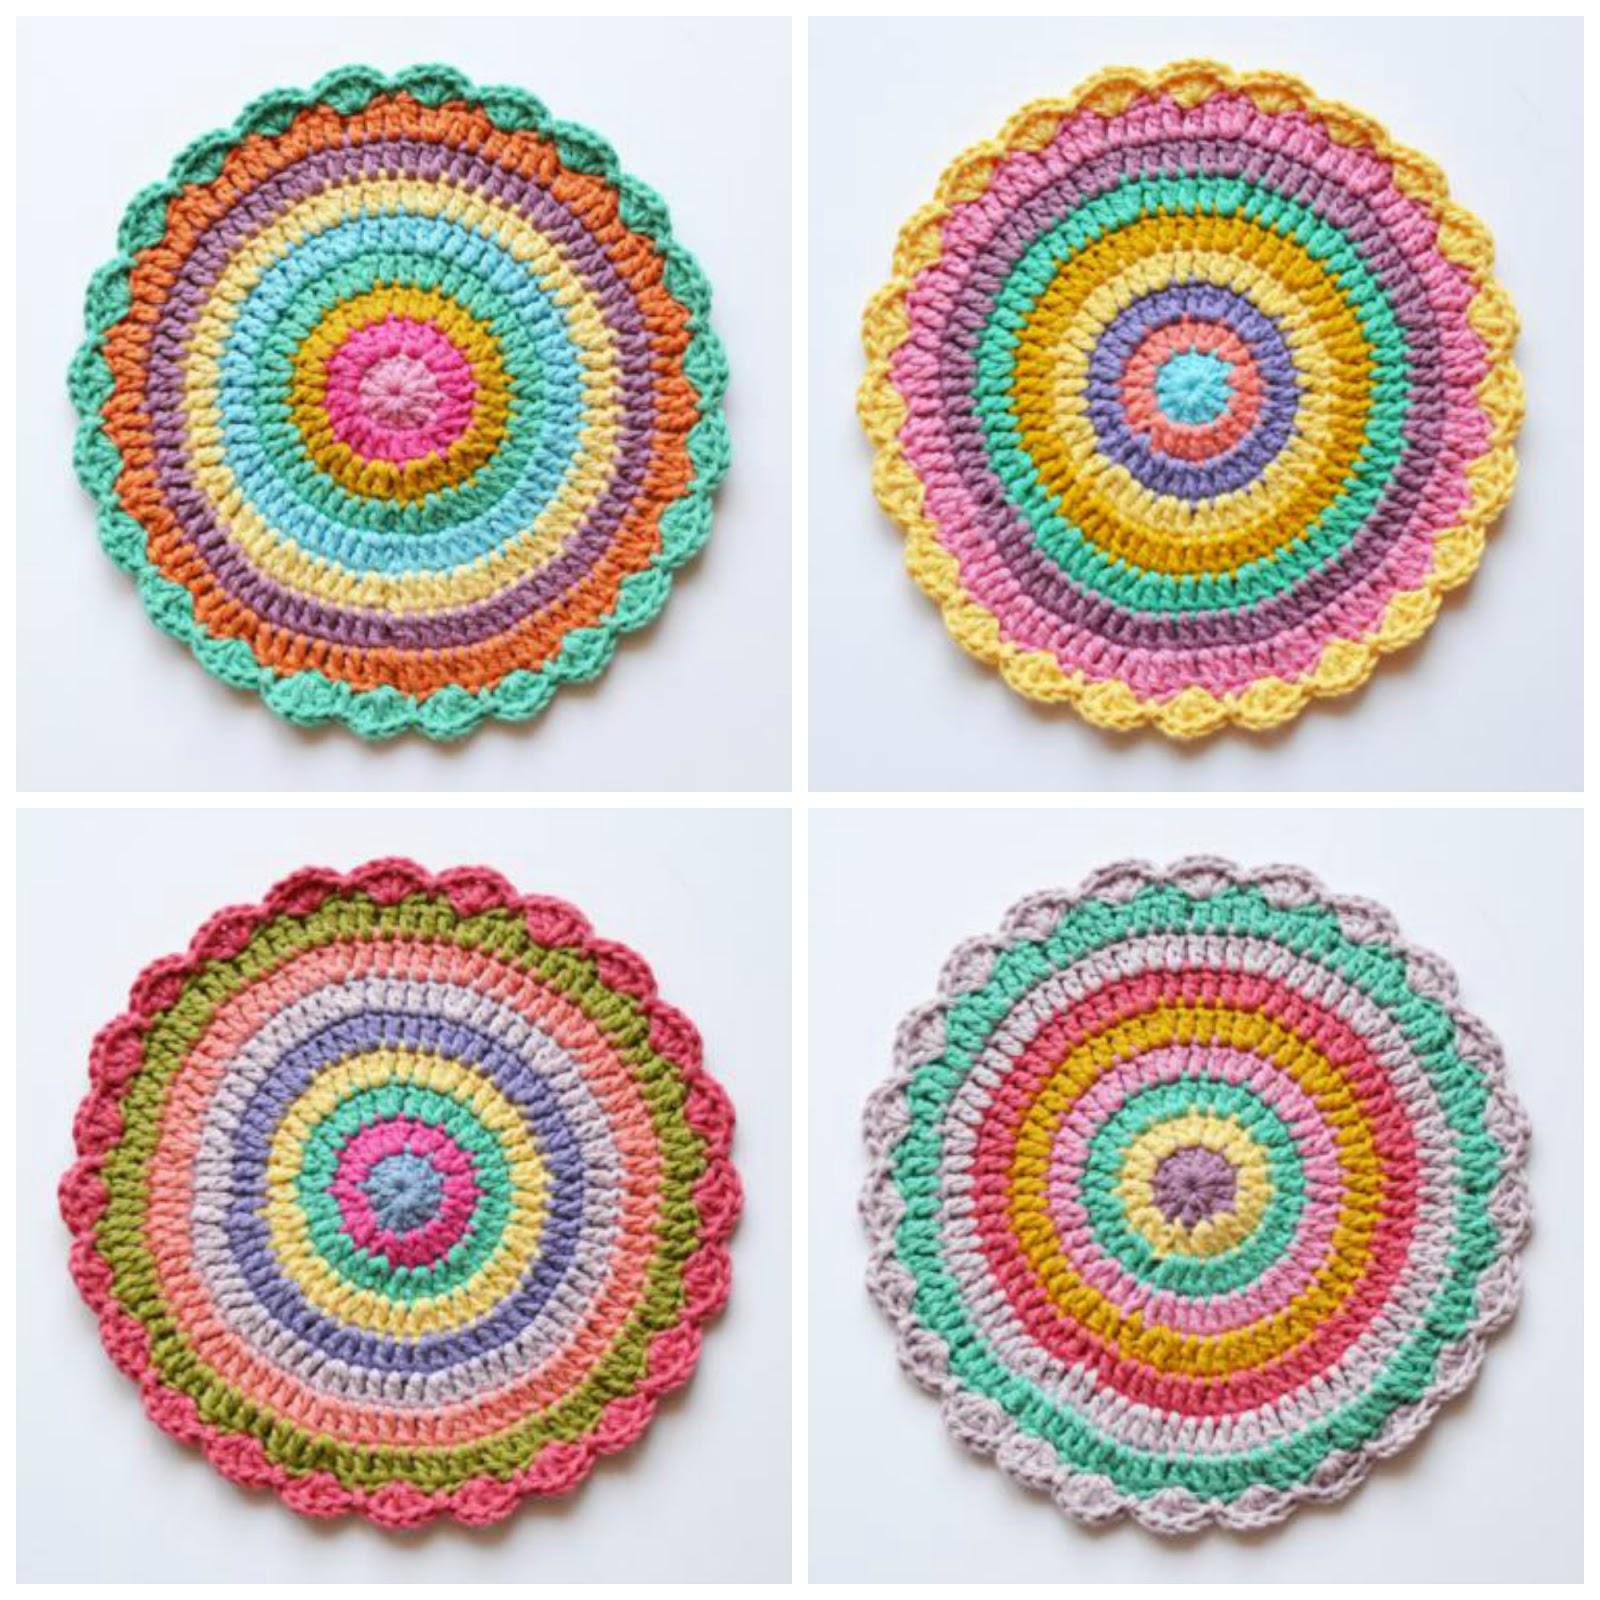 My World Of Wool Mandalas Crochet Festival And The Winner Is